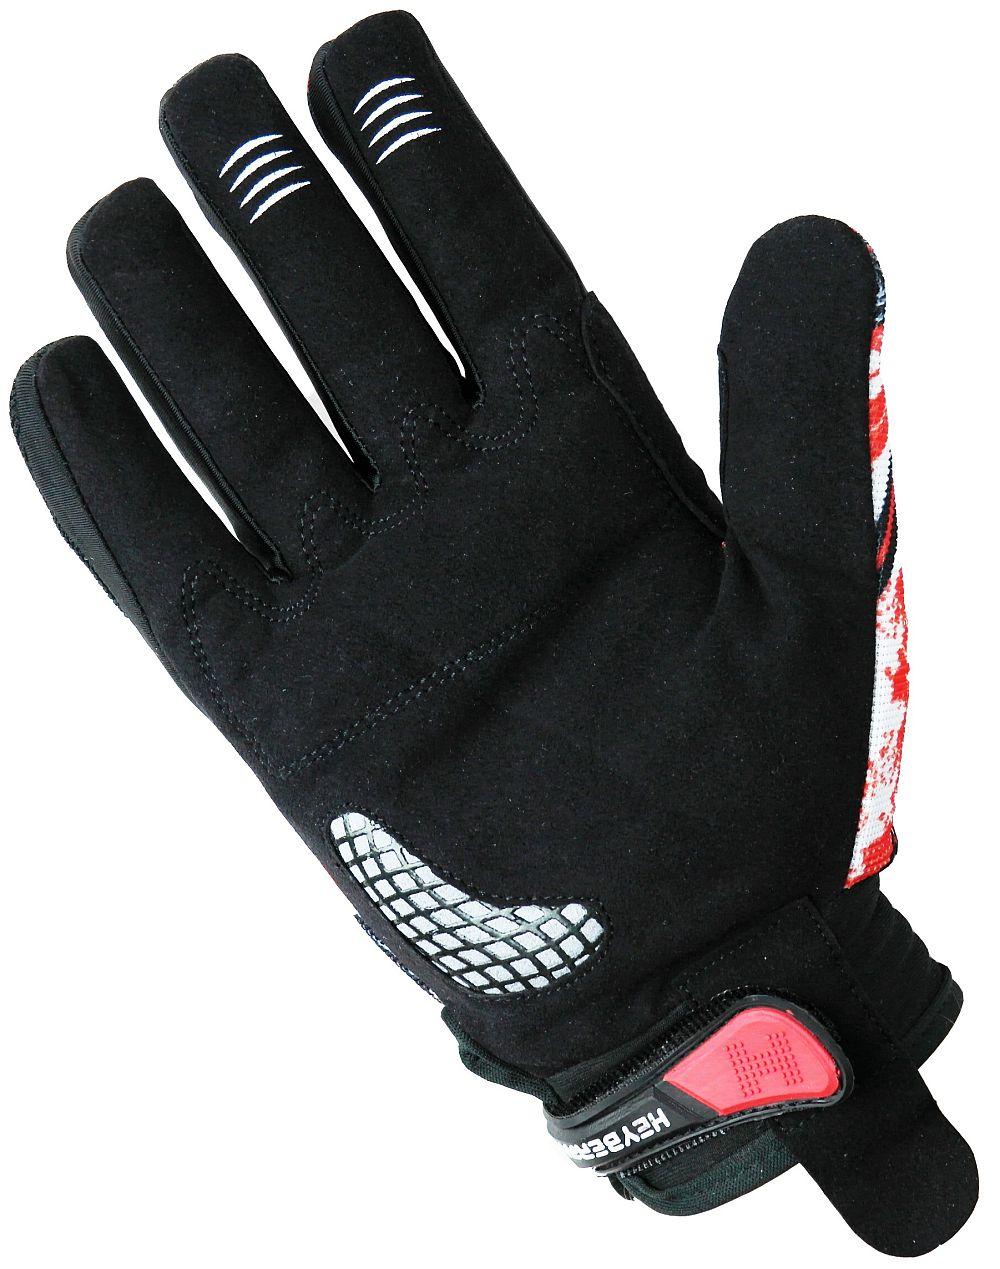 Heyberry Motocross MX Handschuhe schwarz weiß rot Gr. S - XXL